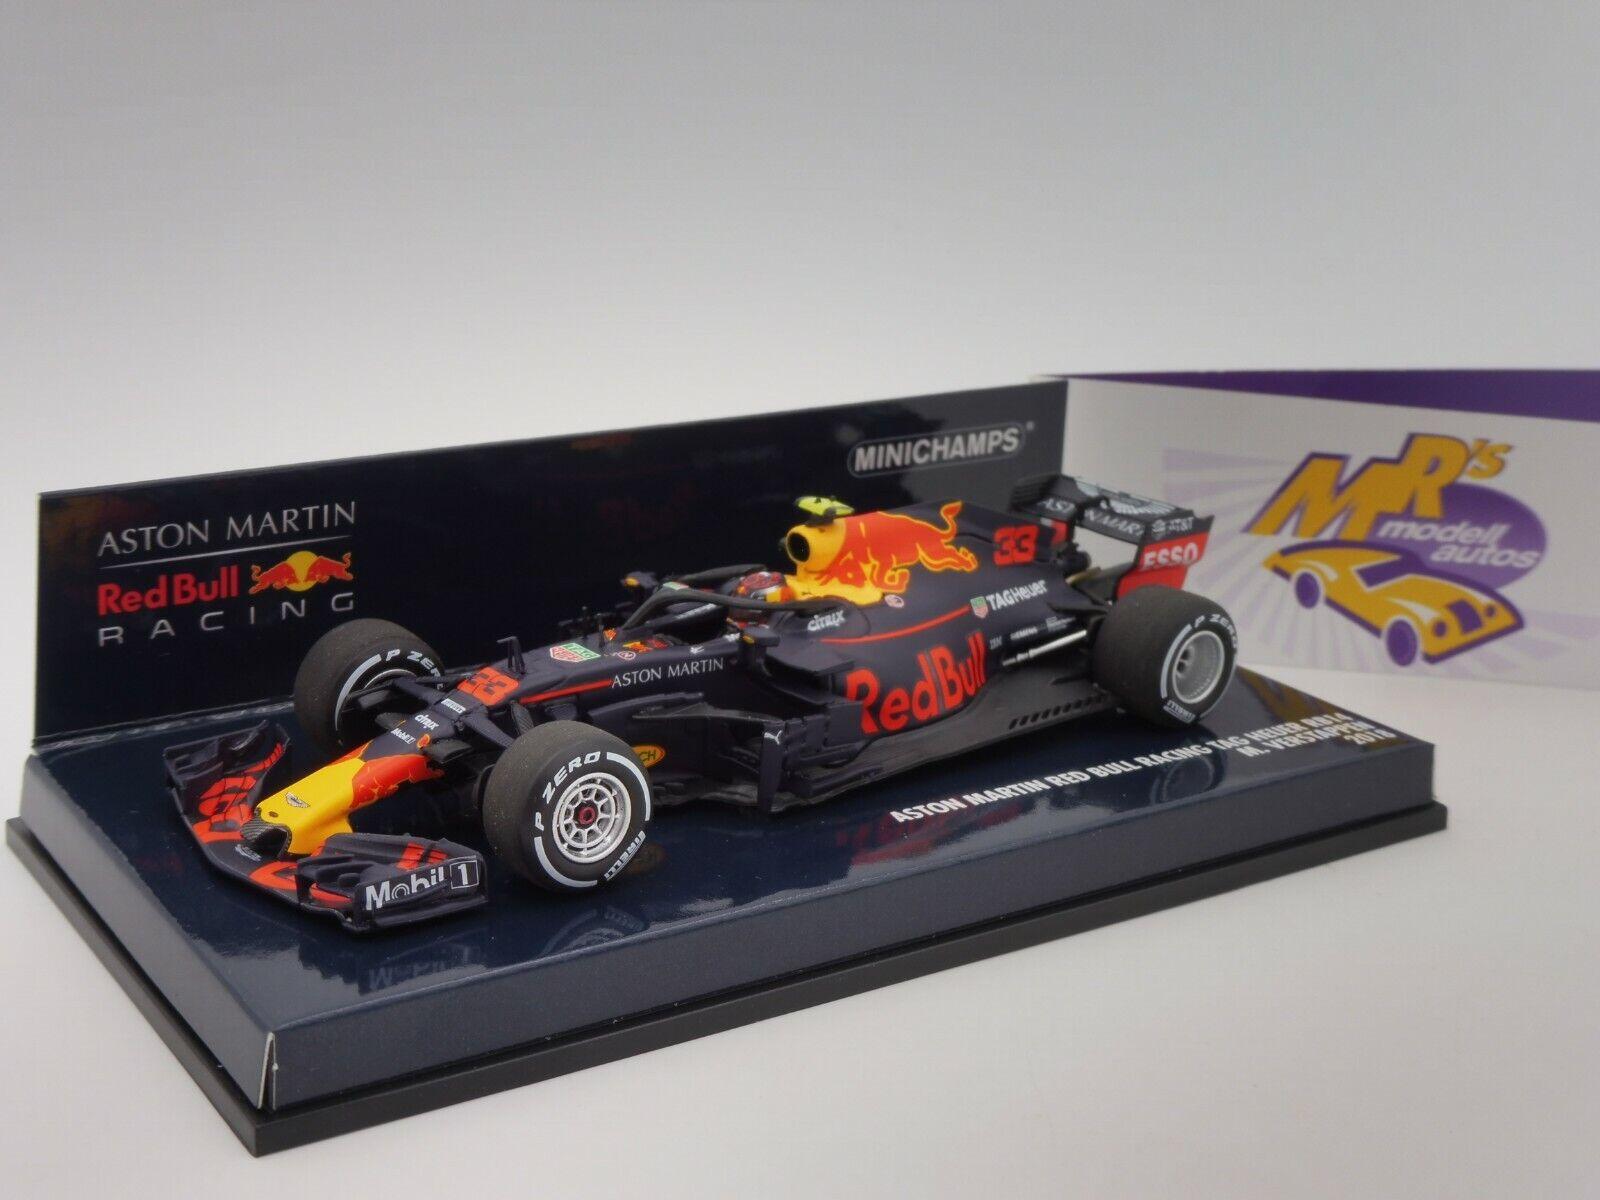 MINICHAMPS 410180033   ASTON MARTIN rouge Bull rb14 No. 33 f1 2018 Verstappen 1 43